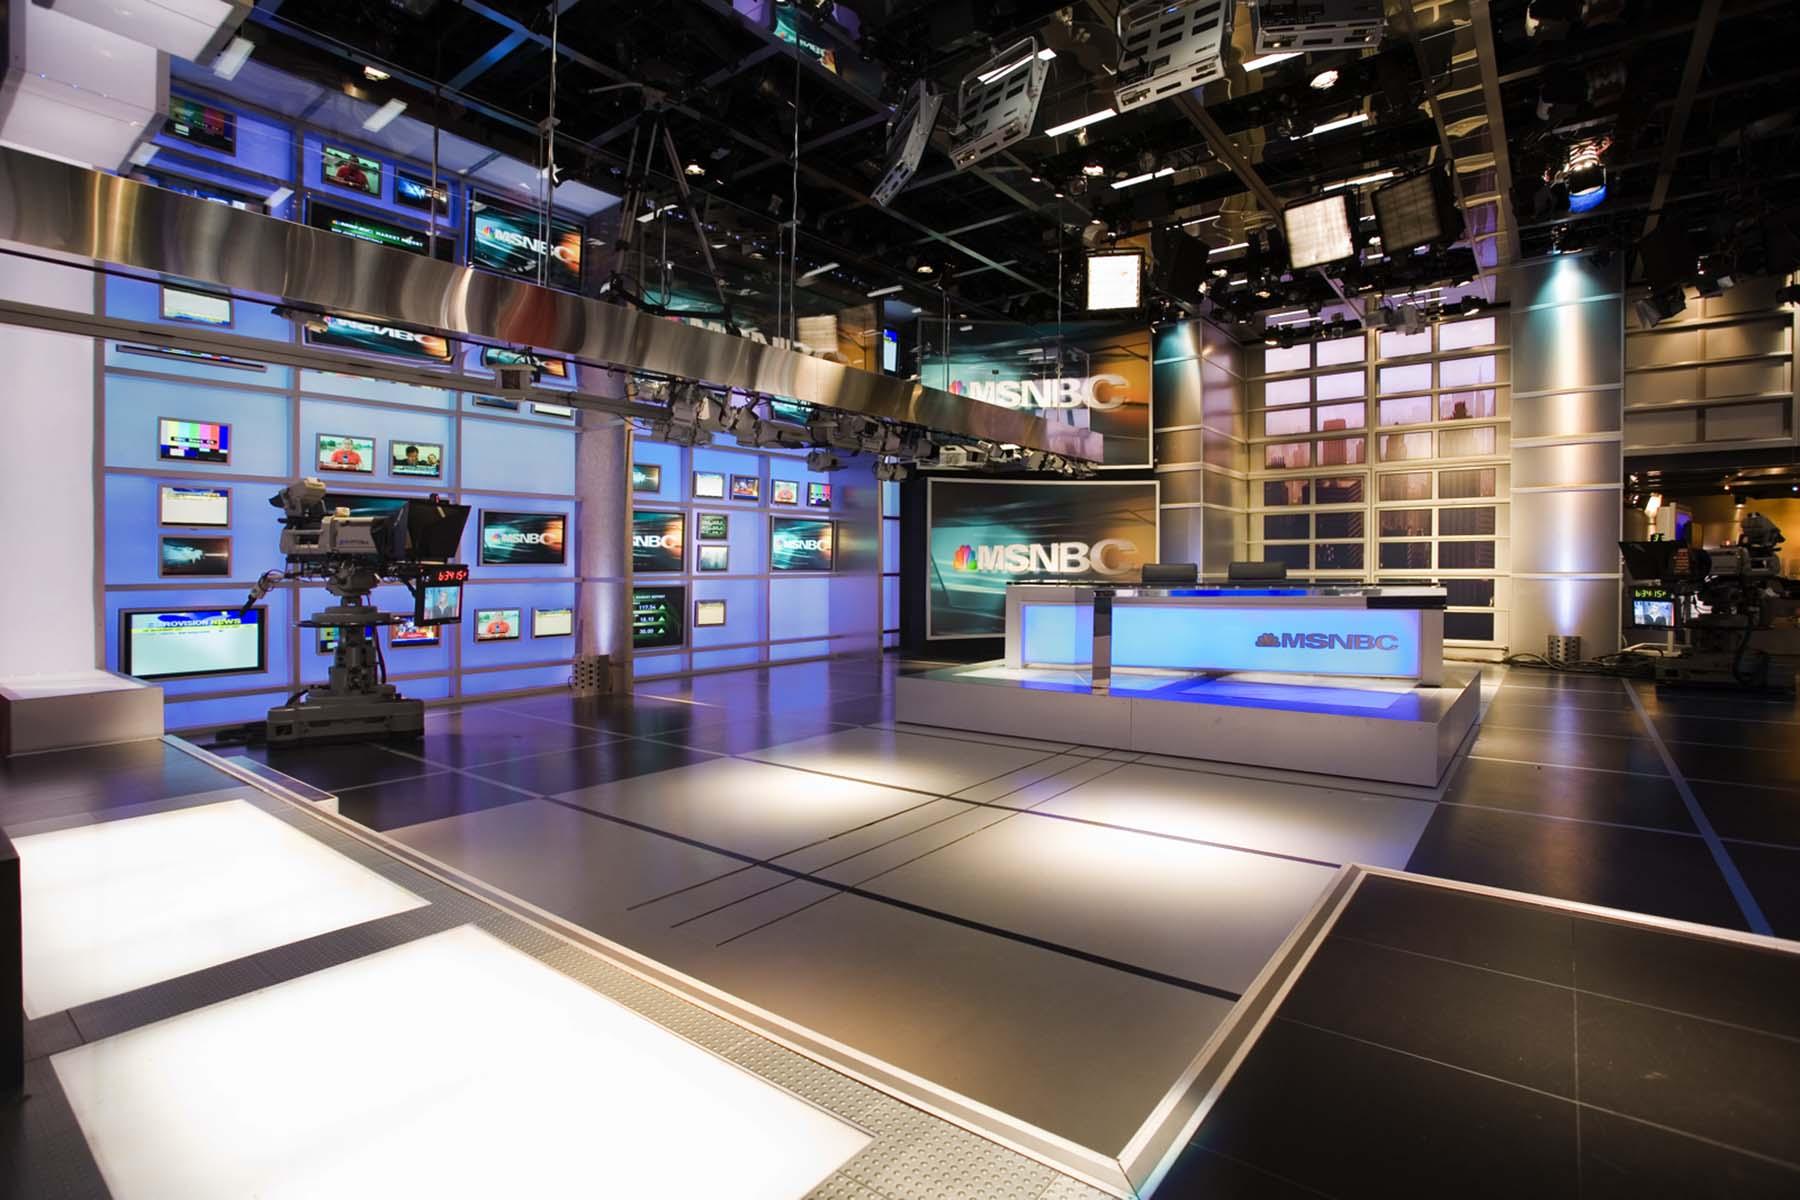 MSNBC live stream Washington News Studio